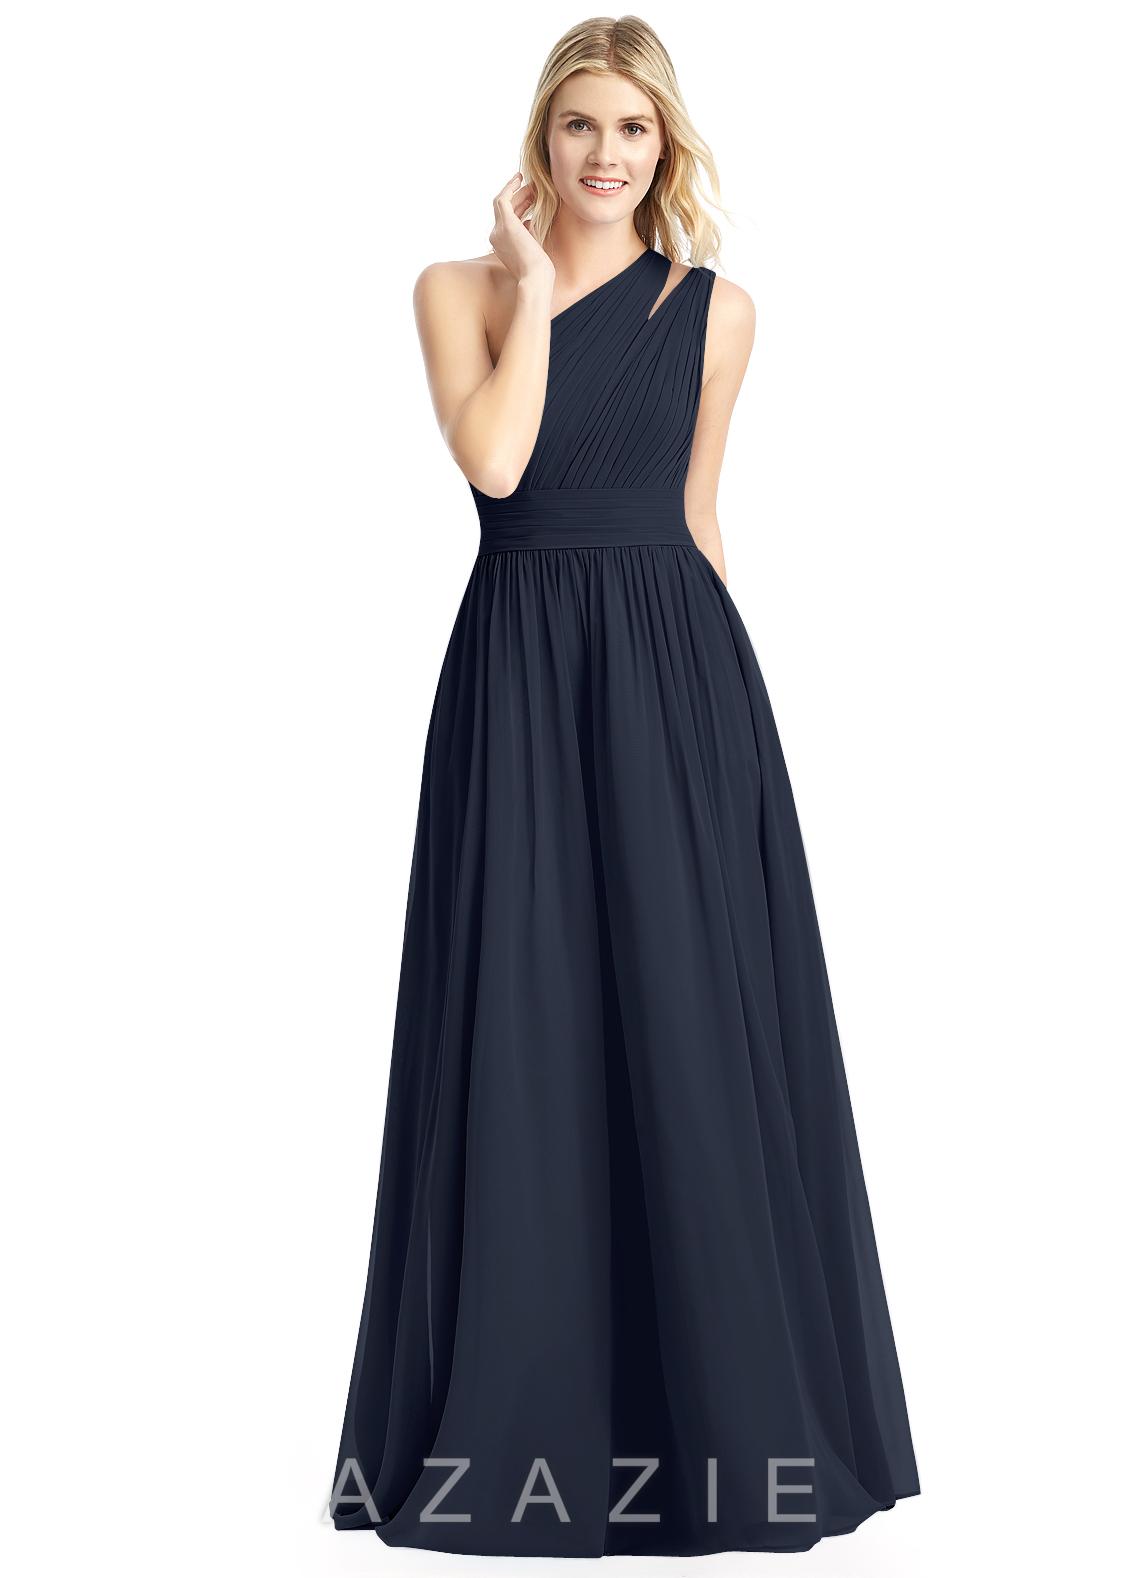 Dark navy bridesmaid dresses dark navy gowns azazie azazie molly azazie molly ombrellifo Gallery